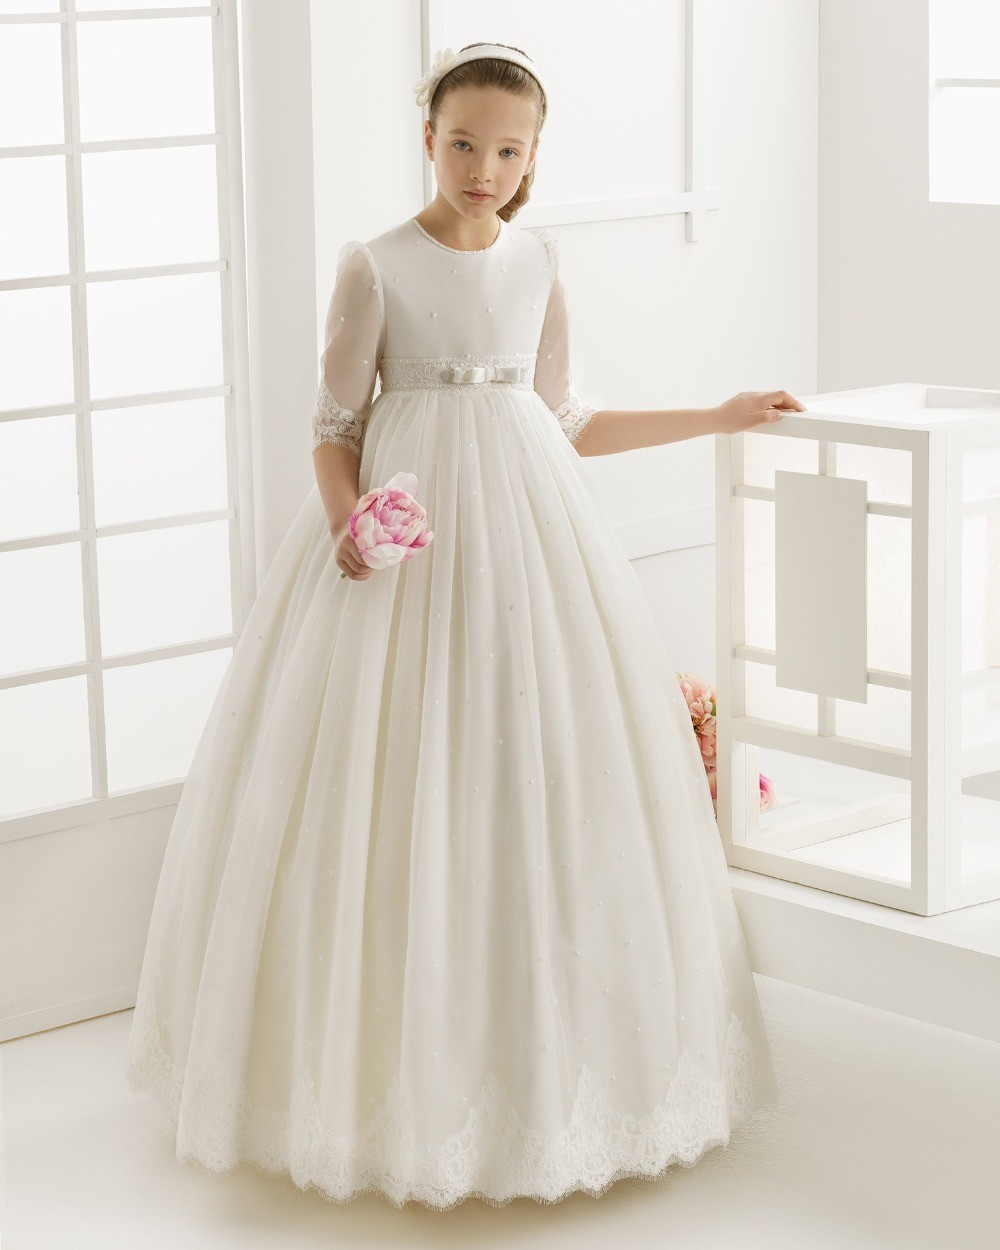 2017 Flower Girl Dresses For Weddings First Communion Dresses For Girls Tulle Ball Gown Half Sleeve Girls Pageant Dresses